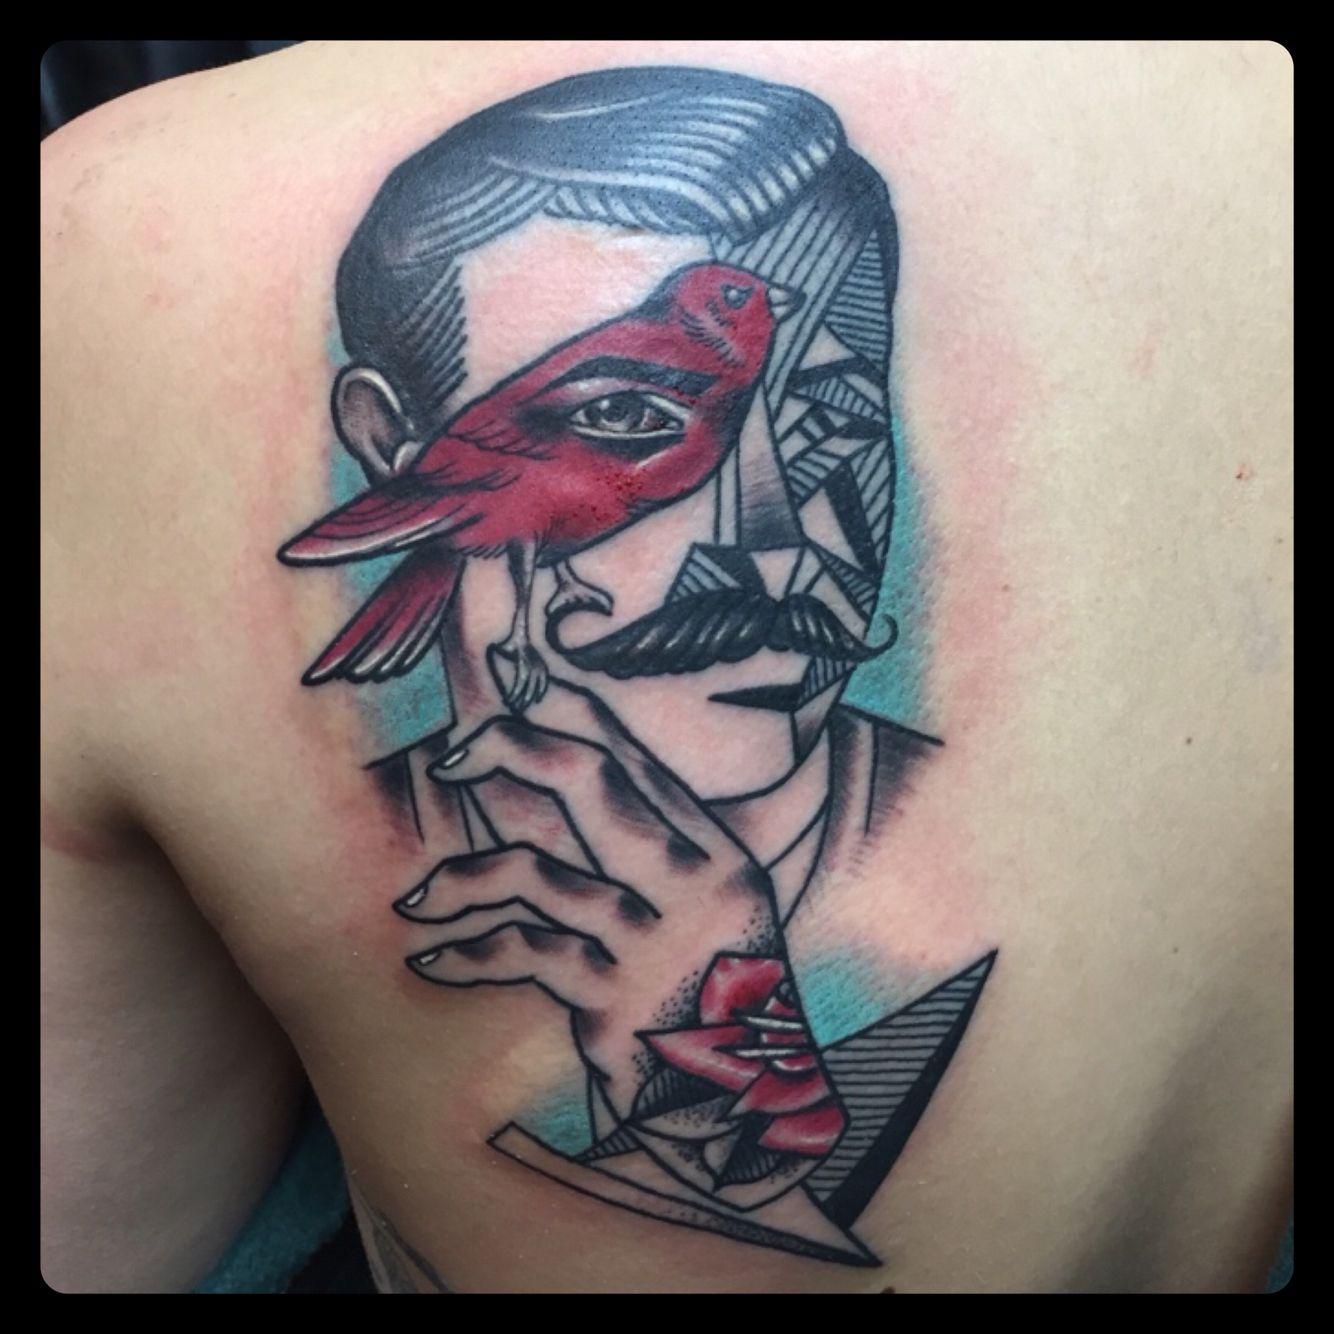 Watercolor tattoo artists in houston texas - Tattoo By Elijah Nguyen From Skin Stories Tattoos In Houston Tx Add Me On Instagram Inklounge82